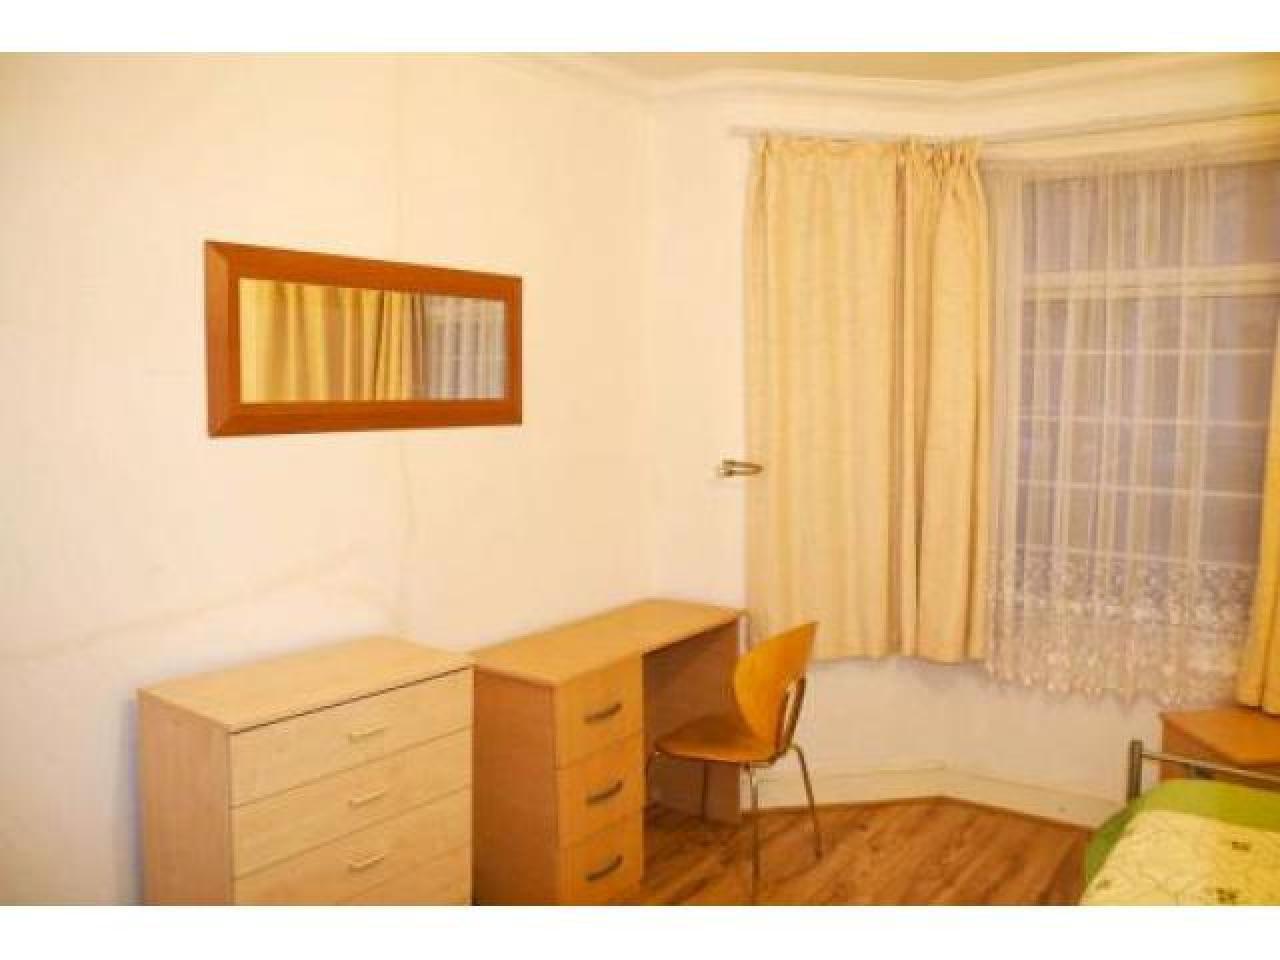 Комната для одного на Walthamstow / Blackhorse road - 1